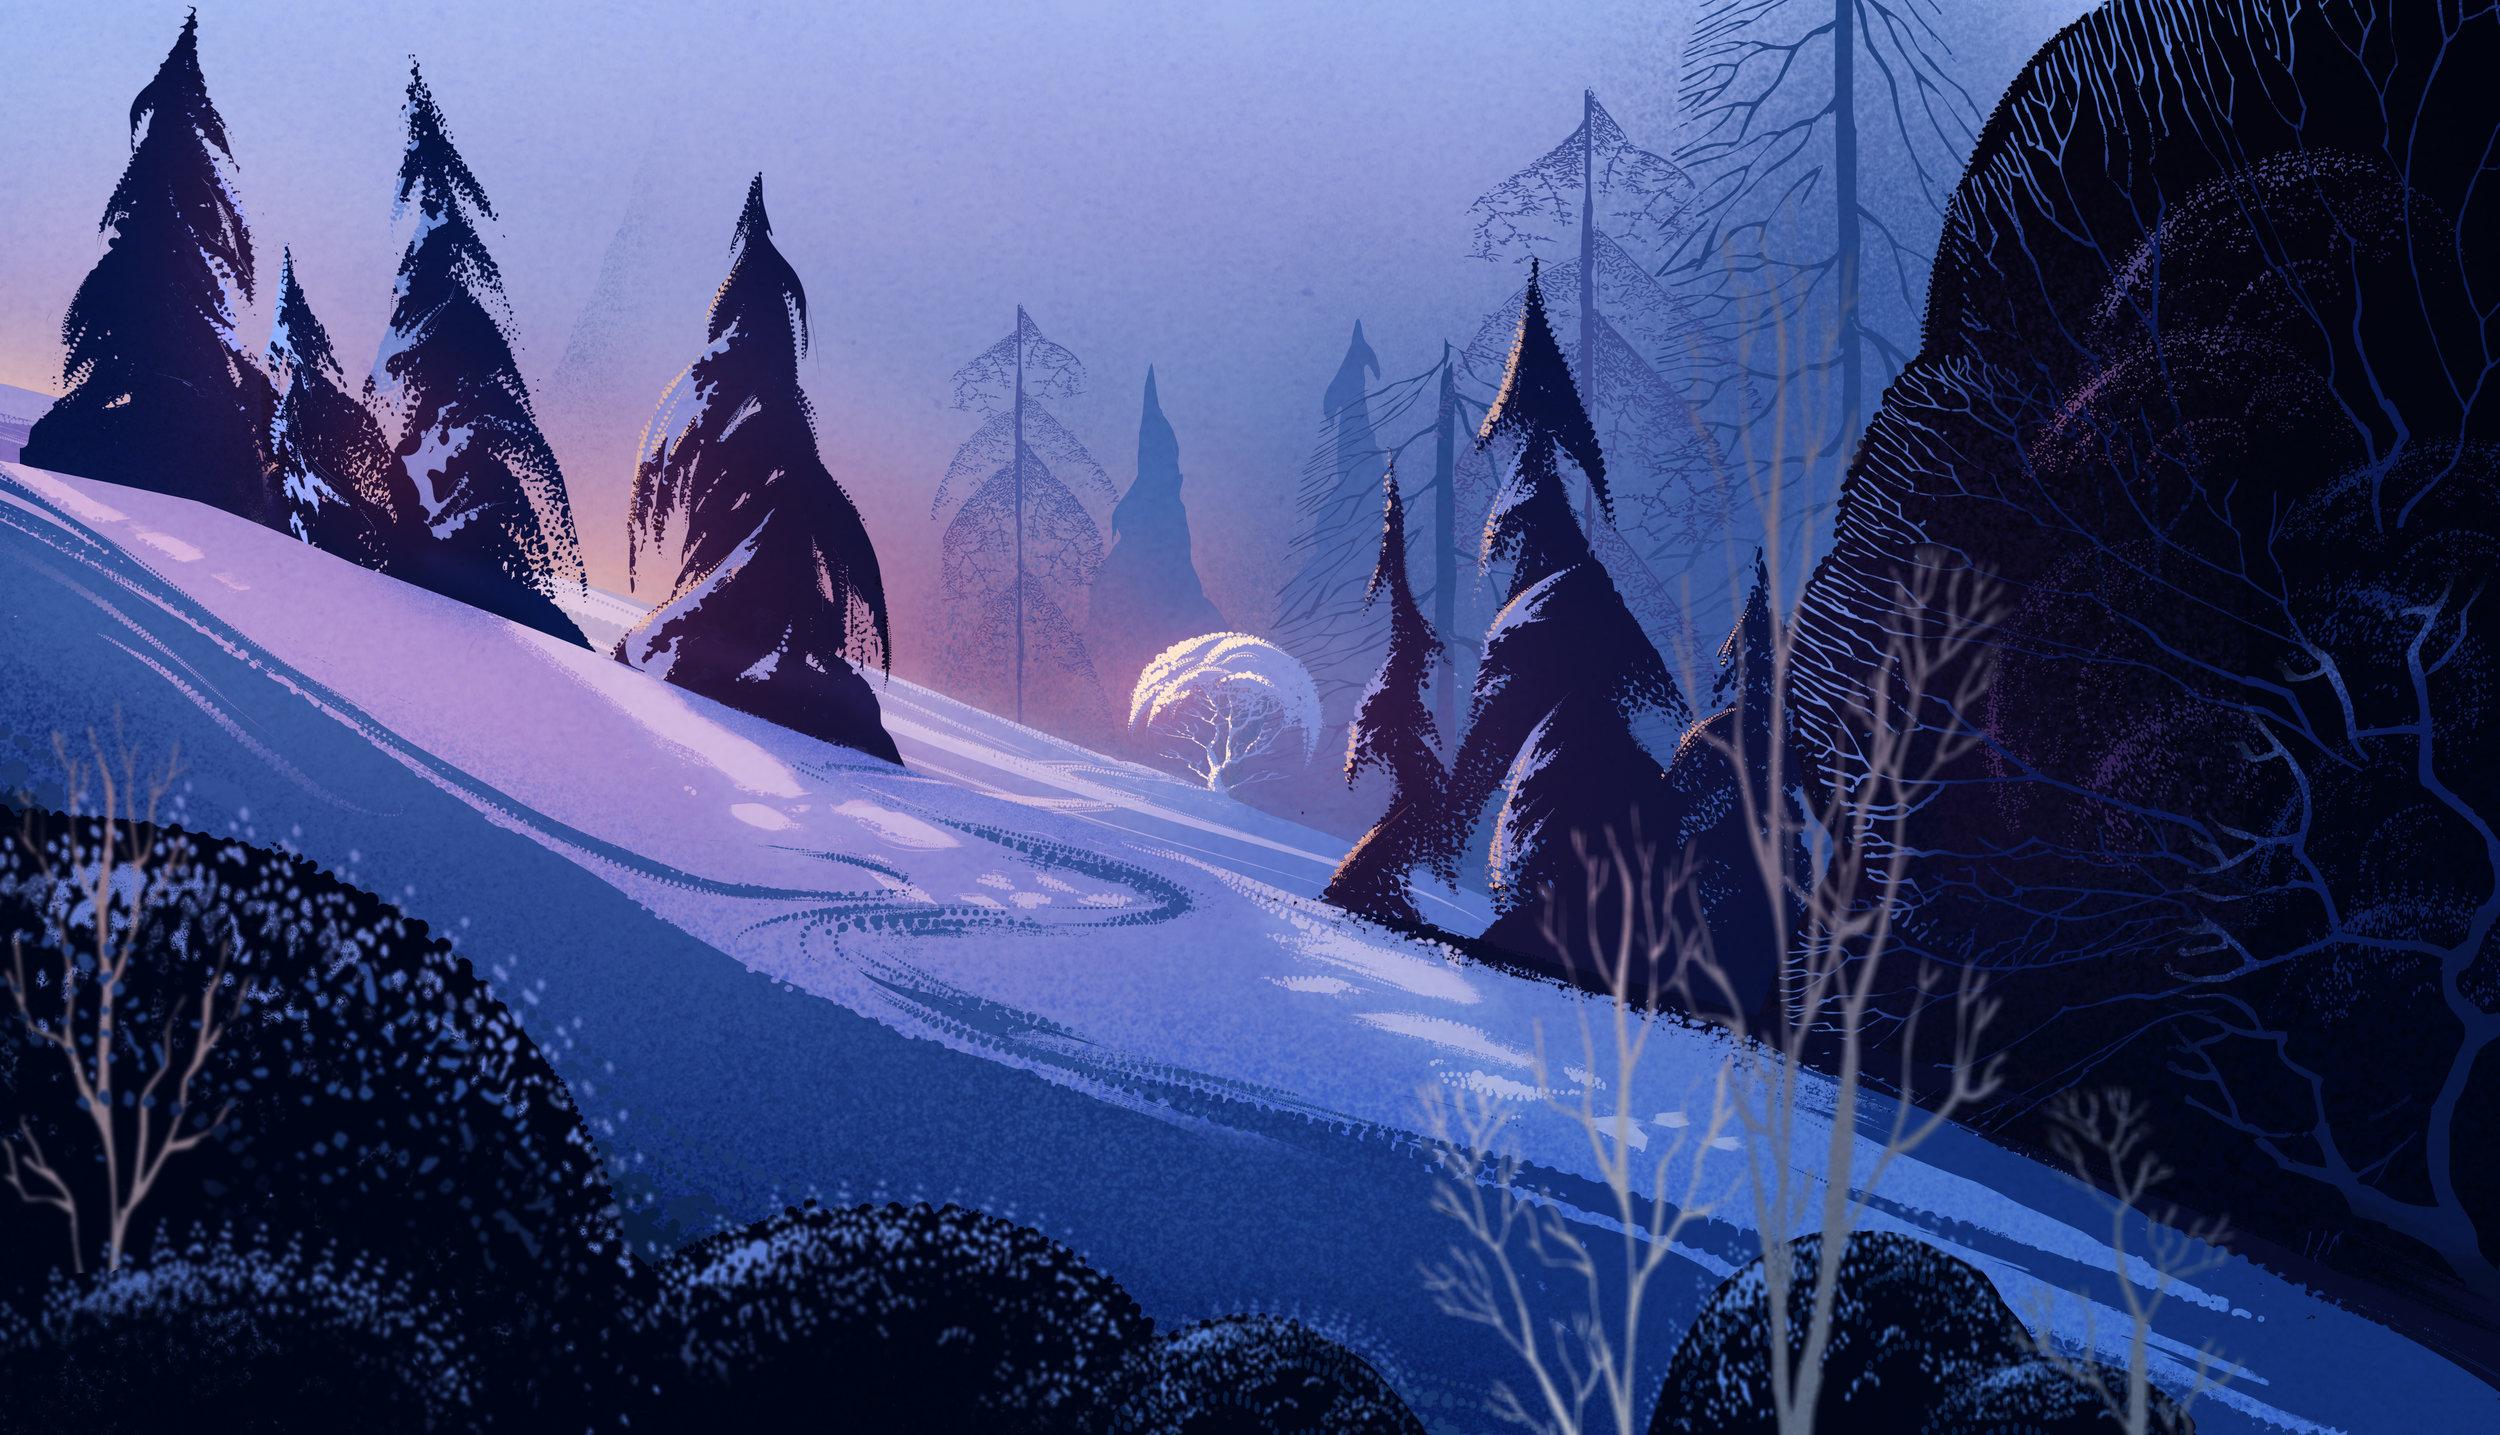 wintertrees_008.jpg